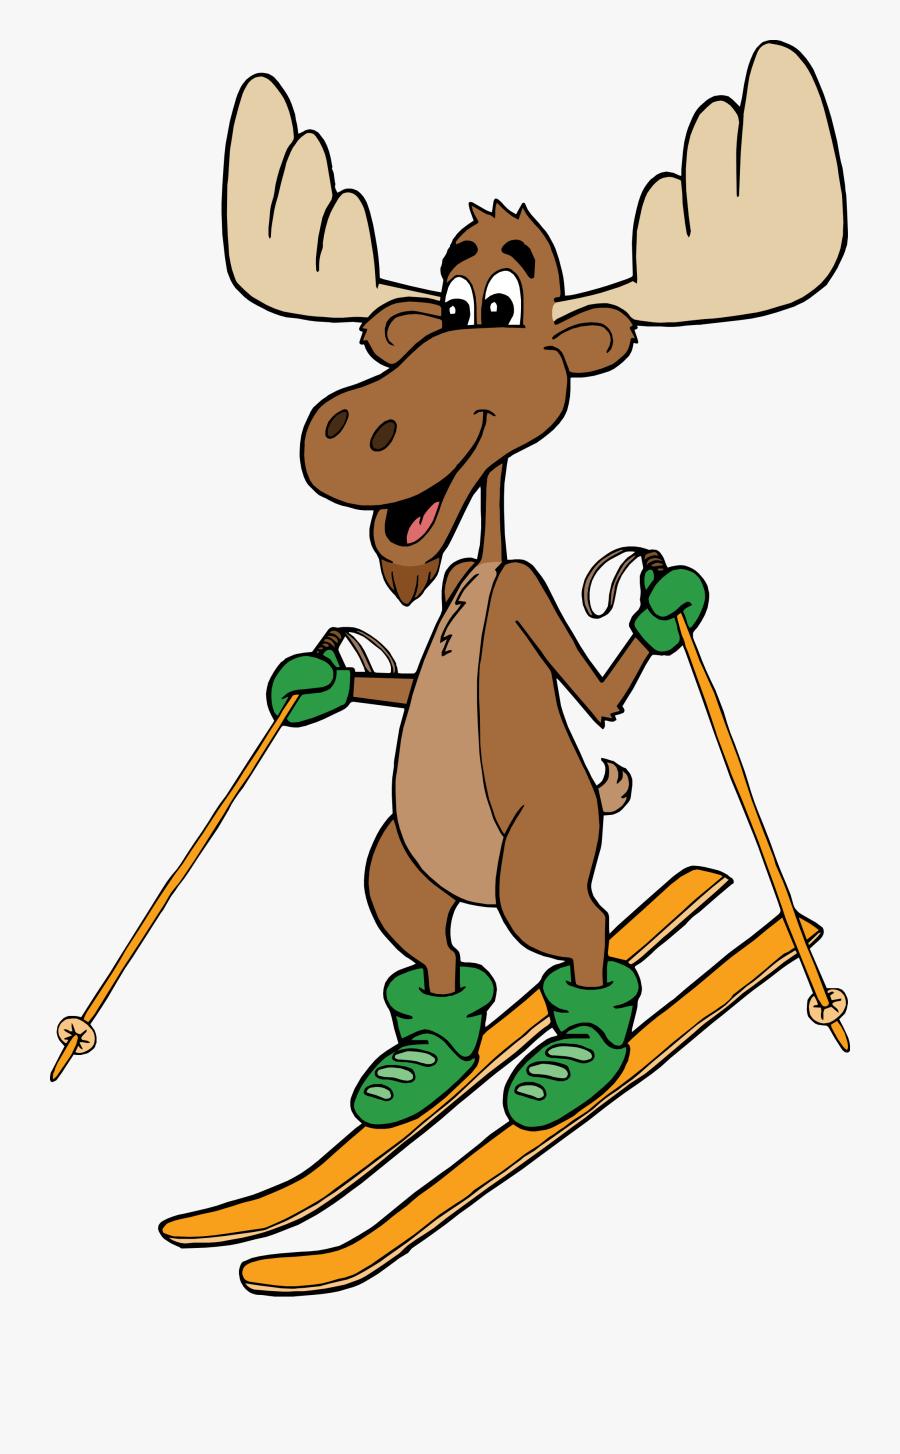 Skis Clipart Ski Equipment Vbs Children Png Free Transparent Clipart Clipartkey